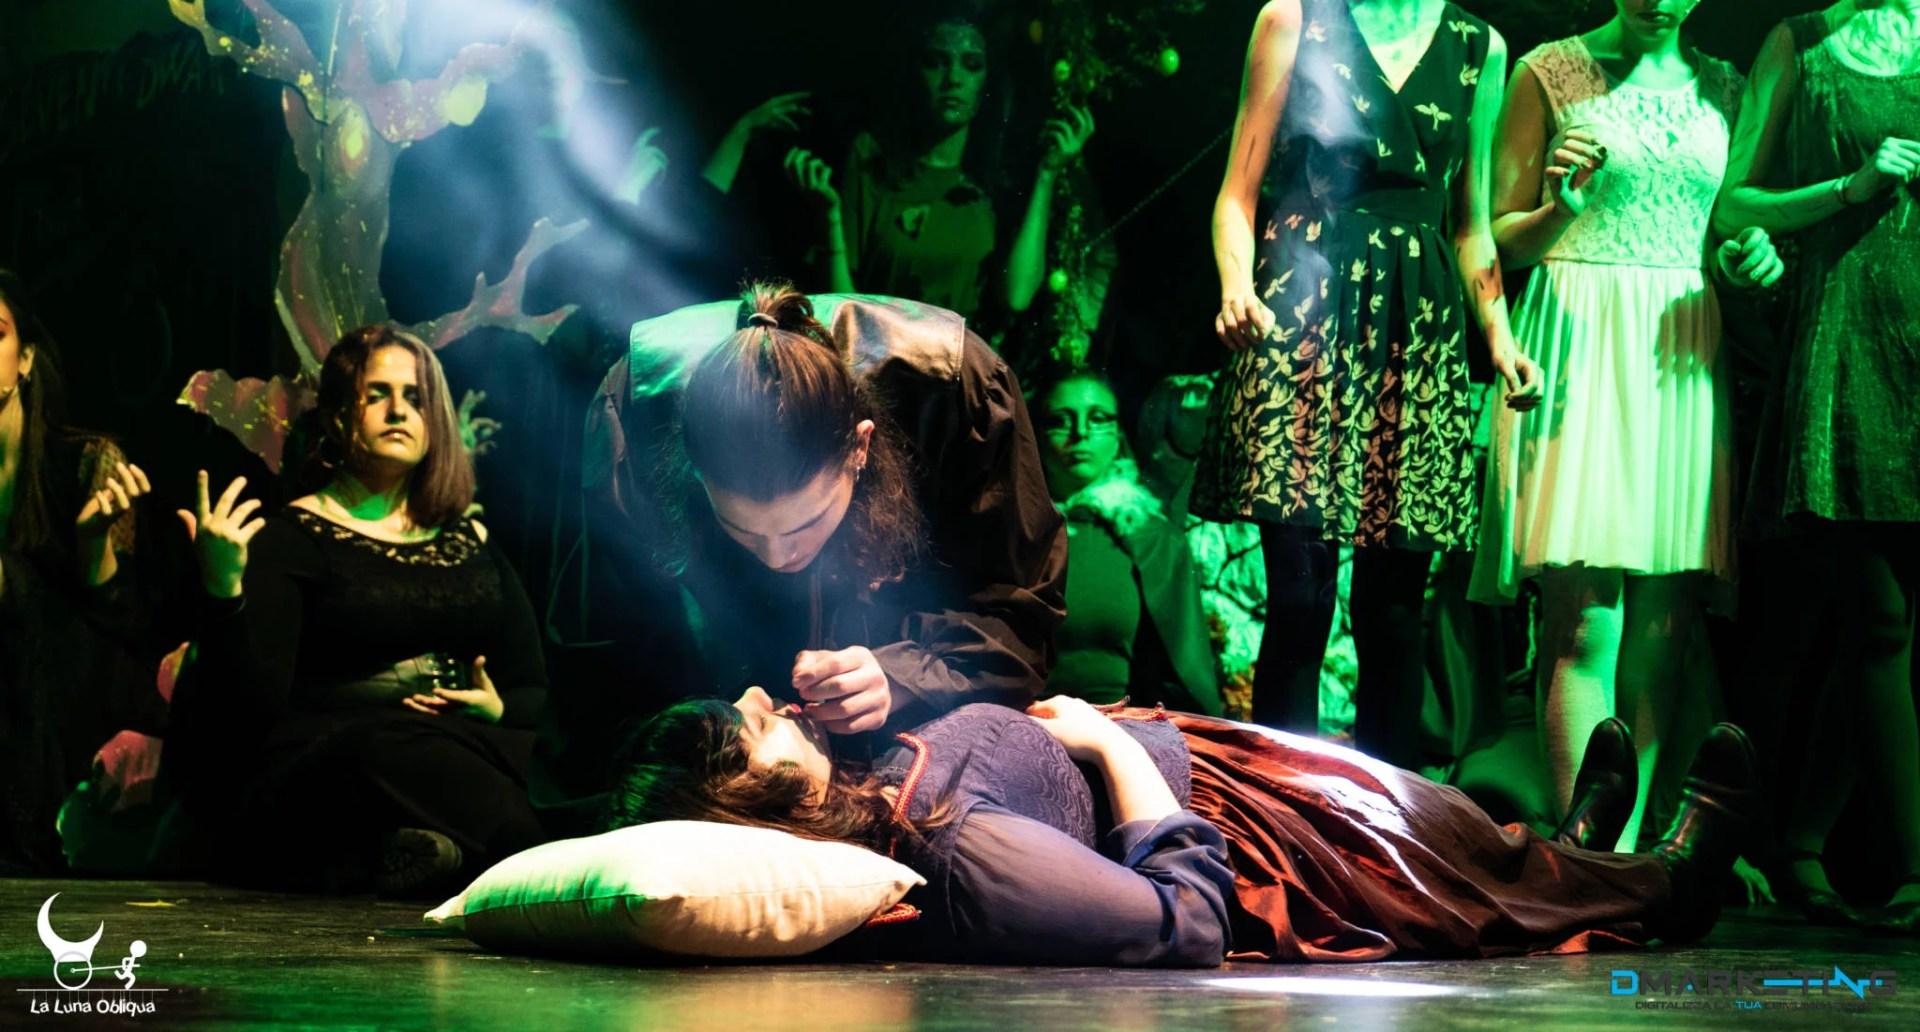 Biancaneve al Teatro di Messina